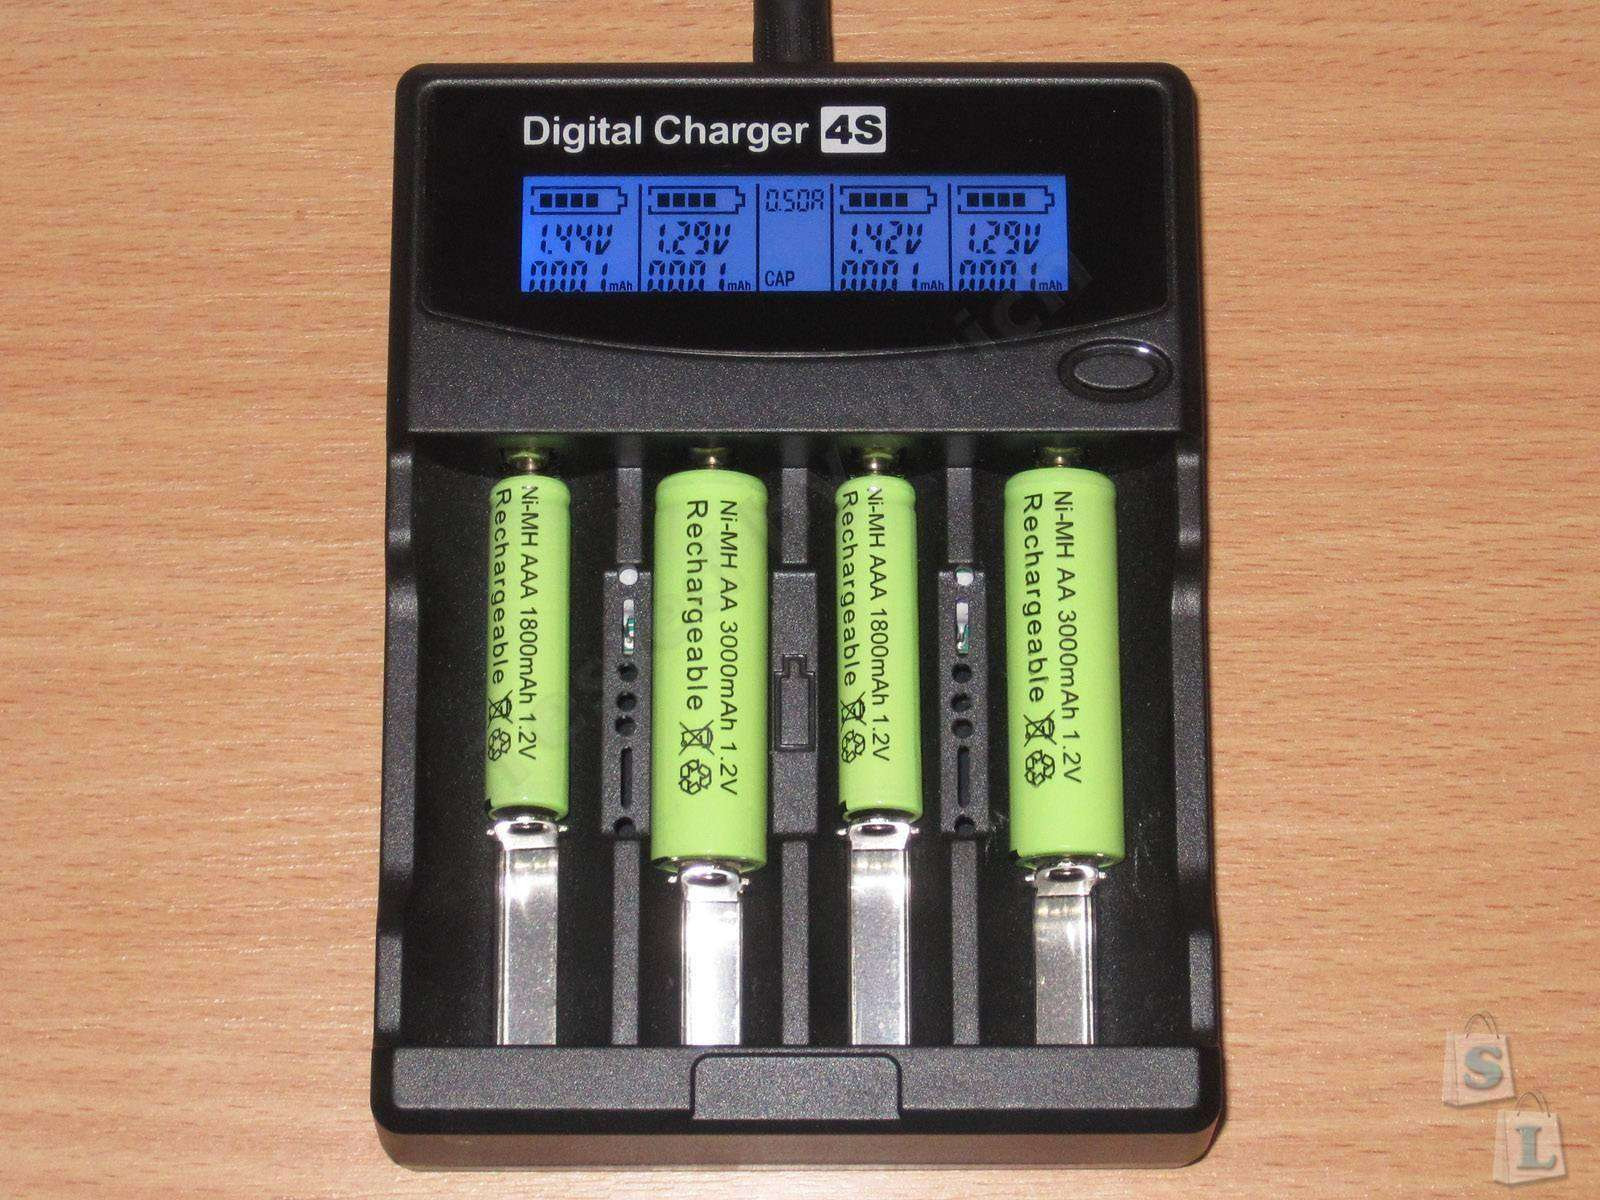 Aliexpress: Вот такие вот 'хорошие' аккумуляторы